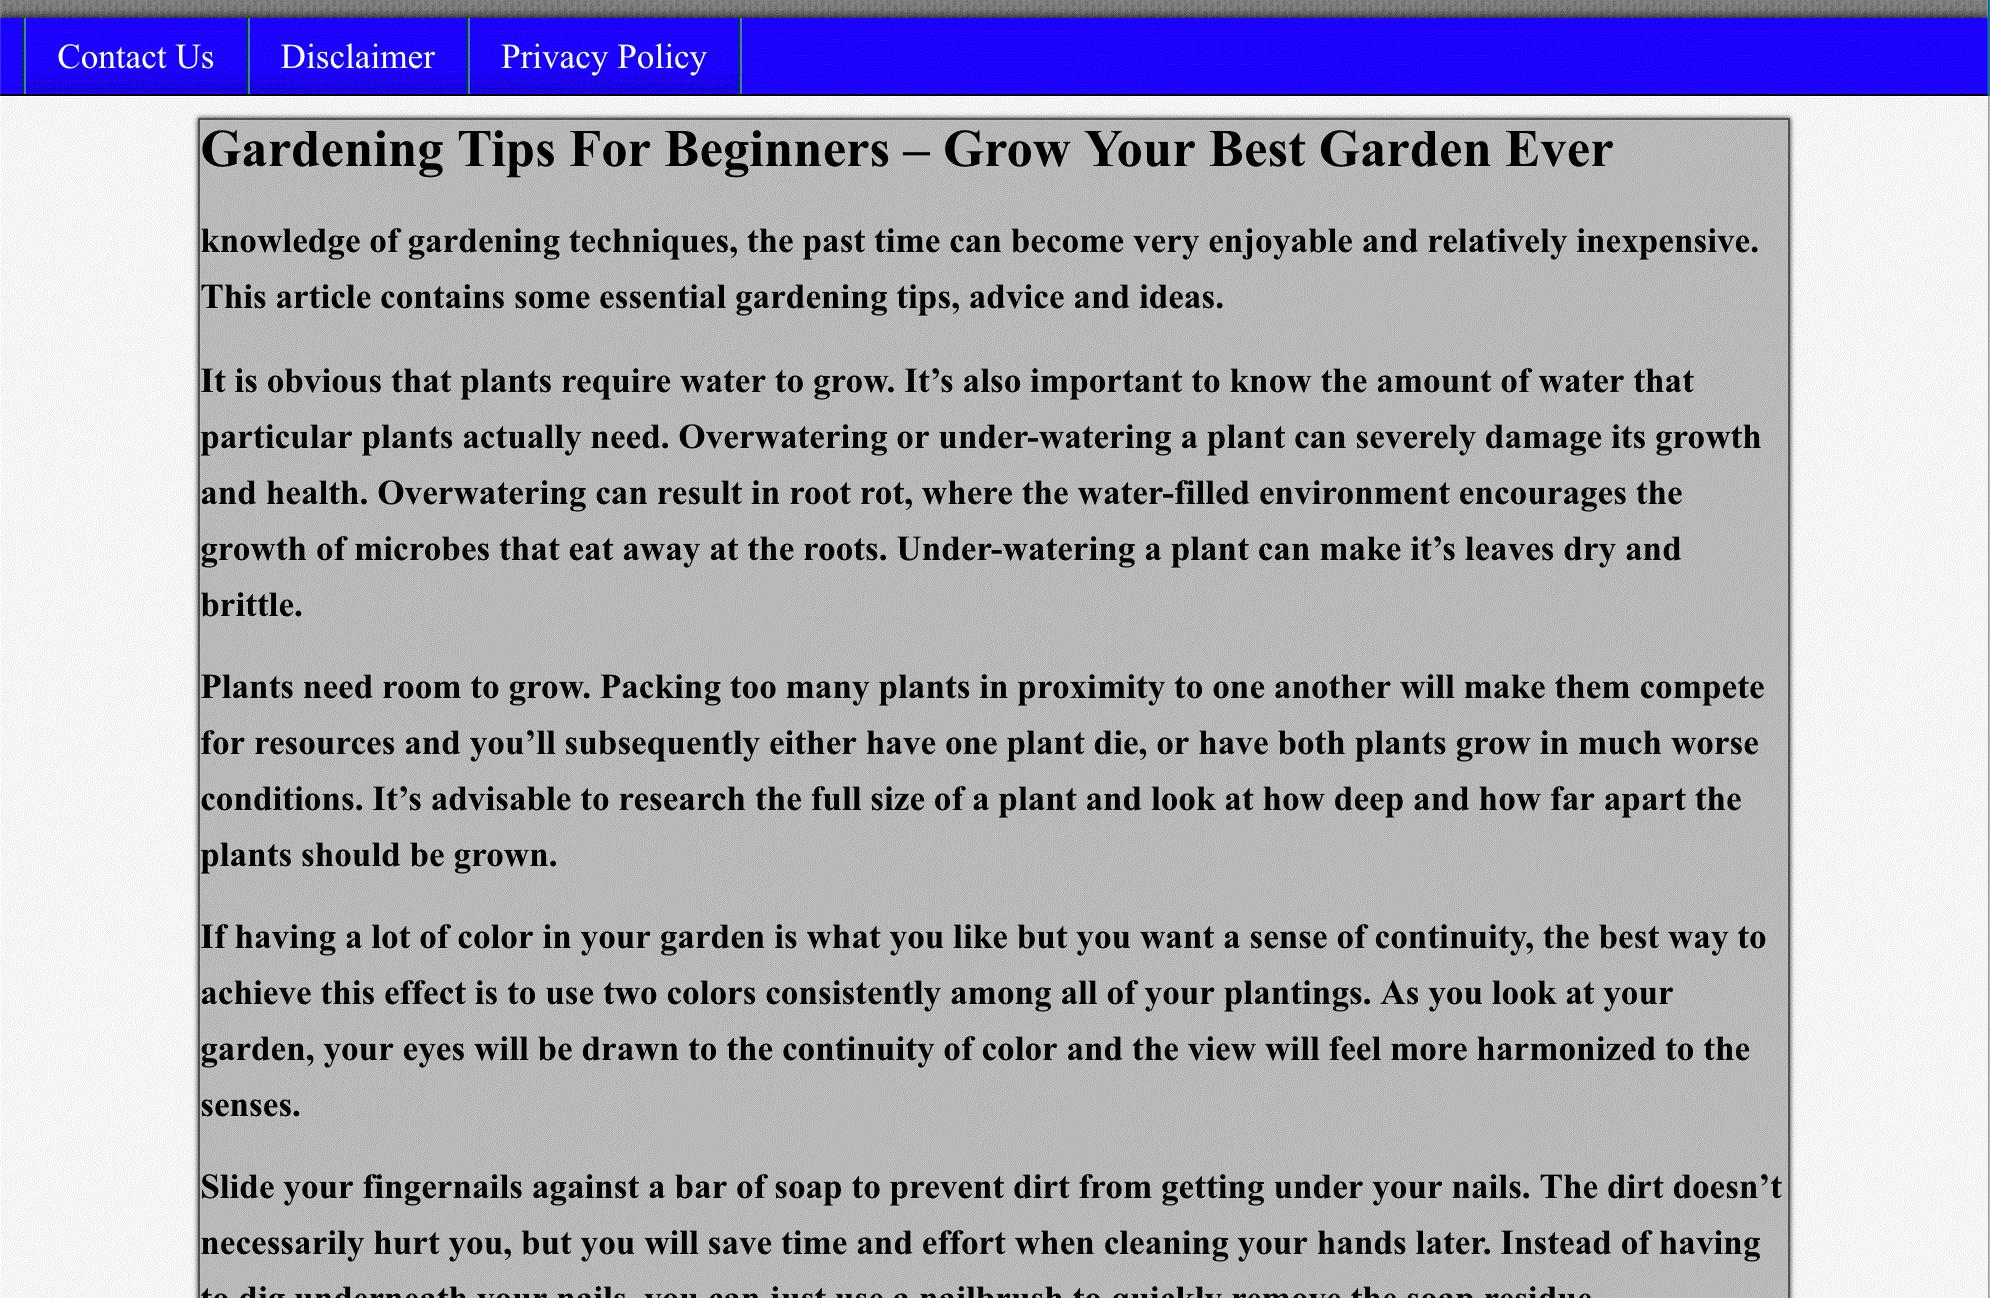 gardening tips for beginers